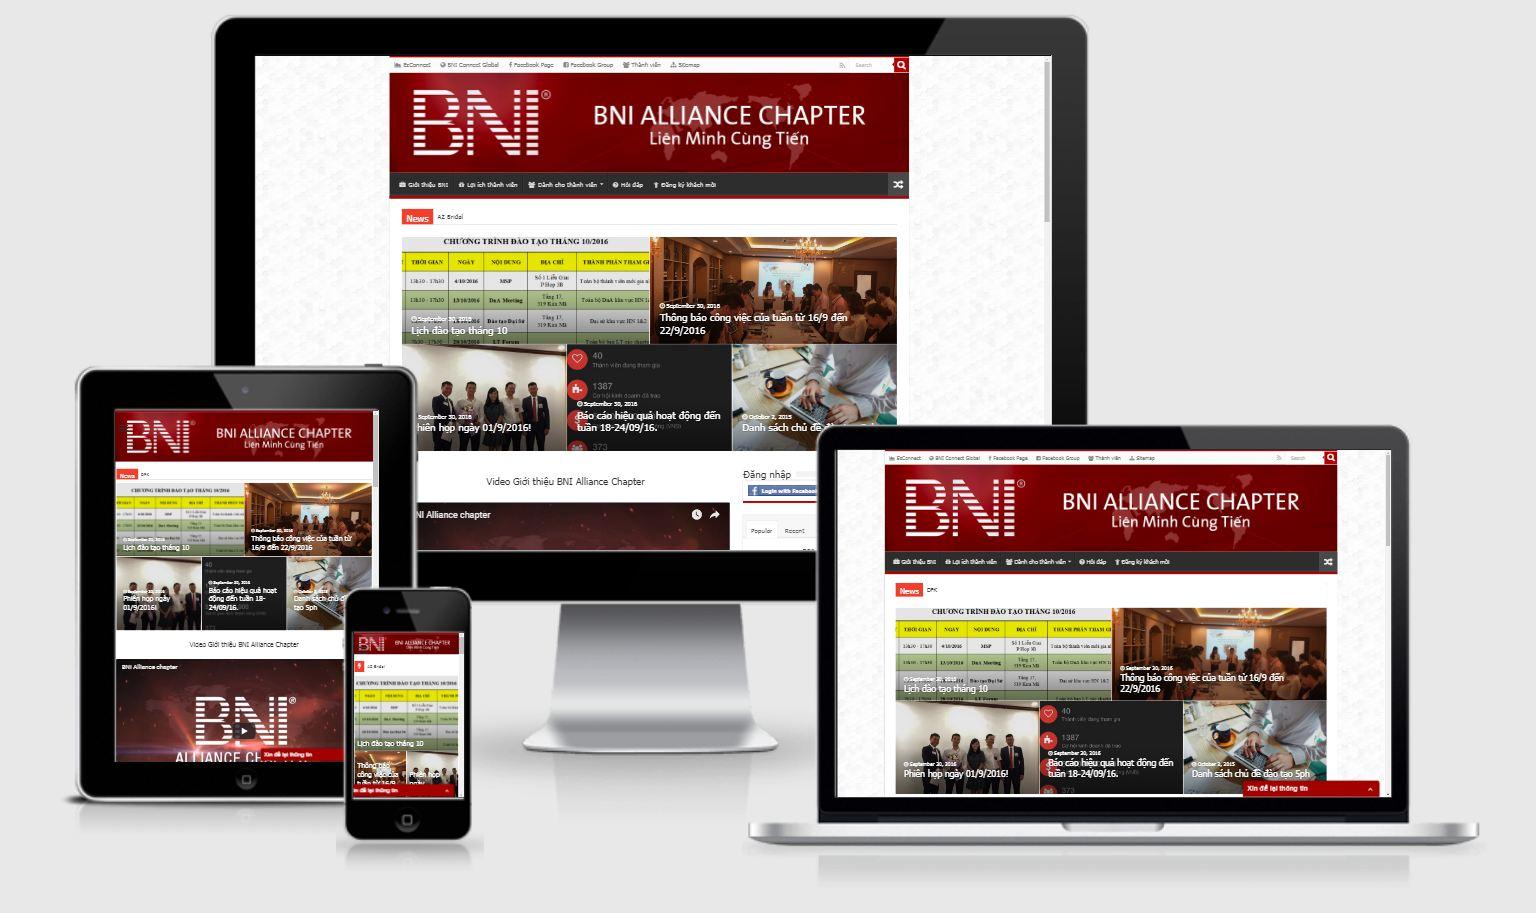 BNI Alliance Chapter